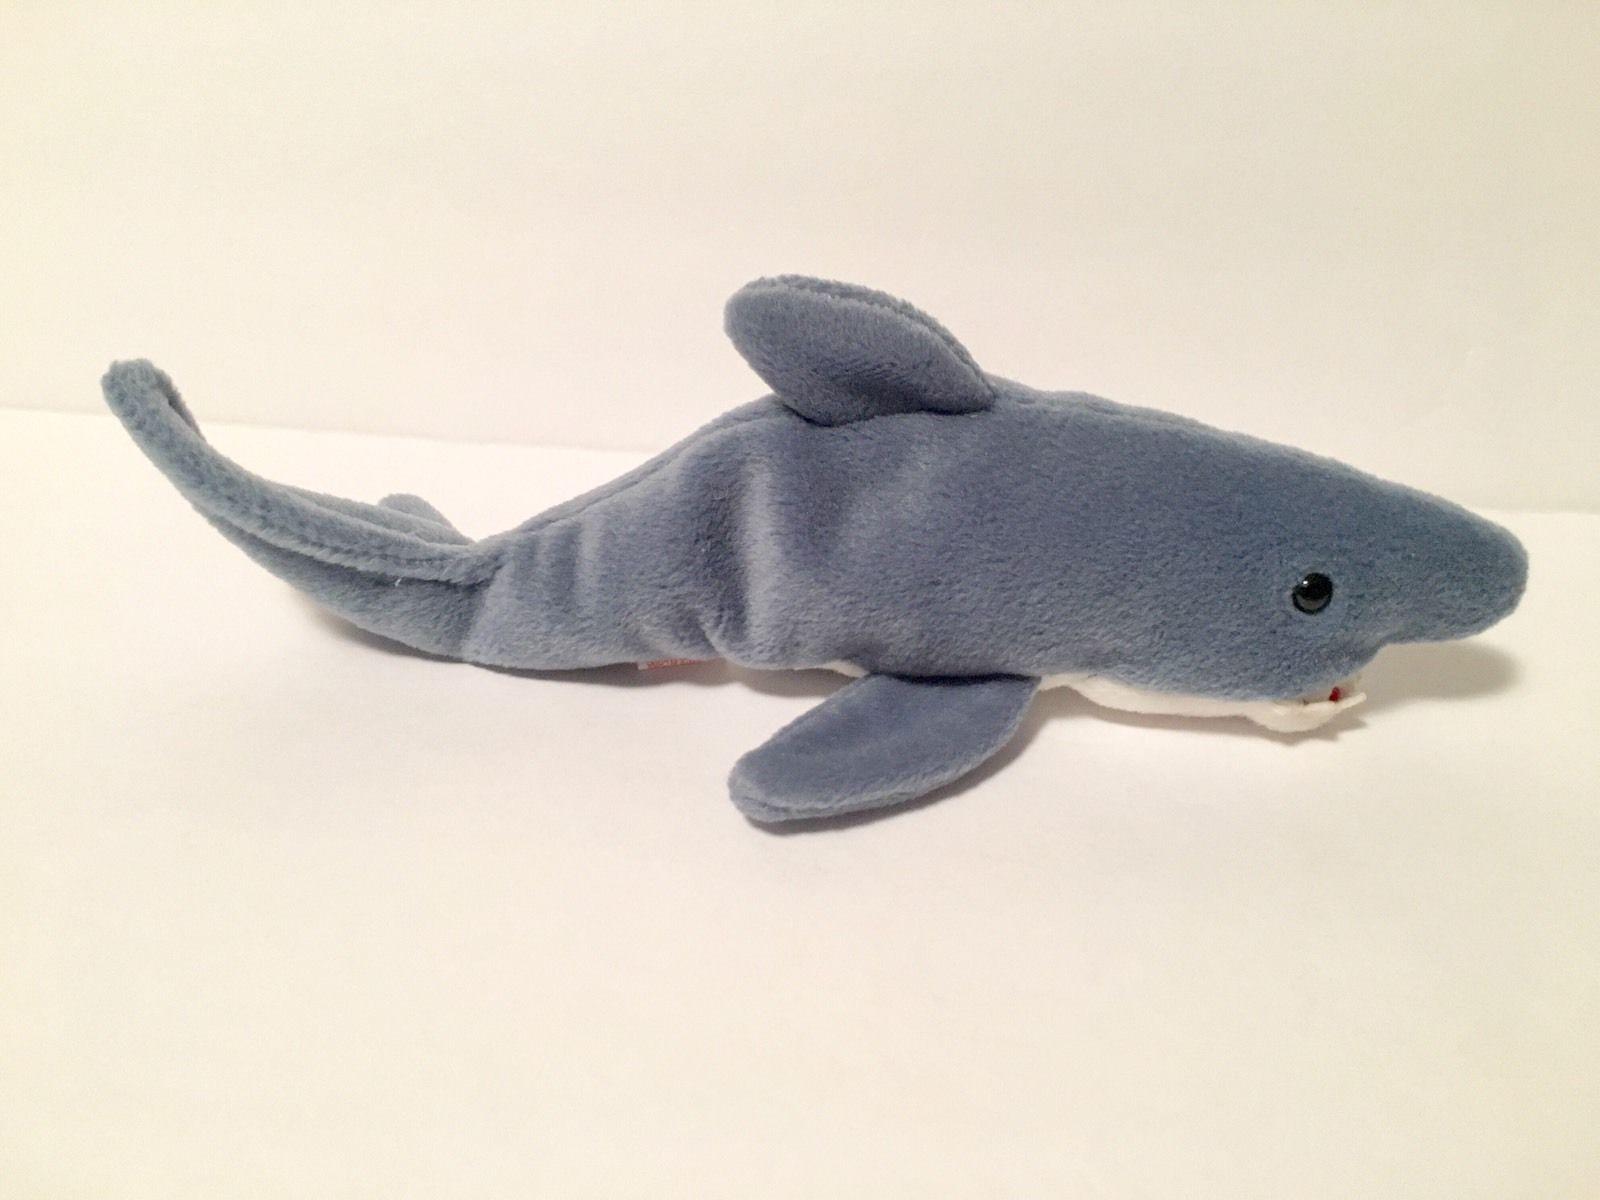 Ty Beanie Babies Plush Beanbag Crunch the Shark Grey White